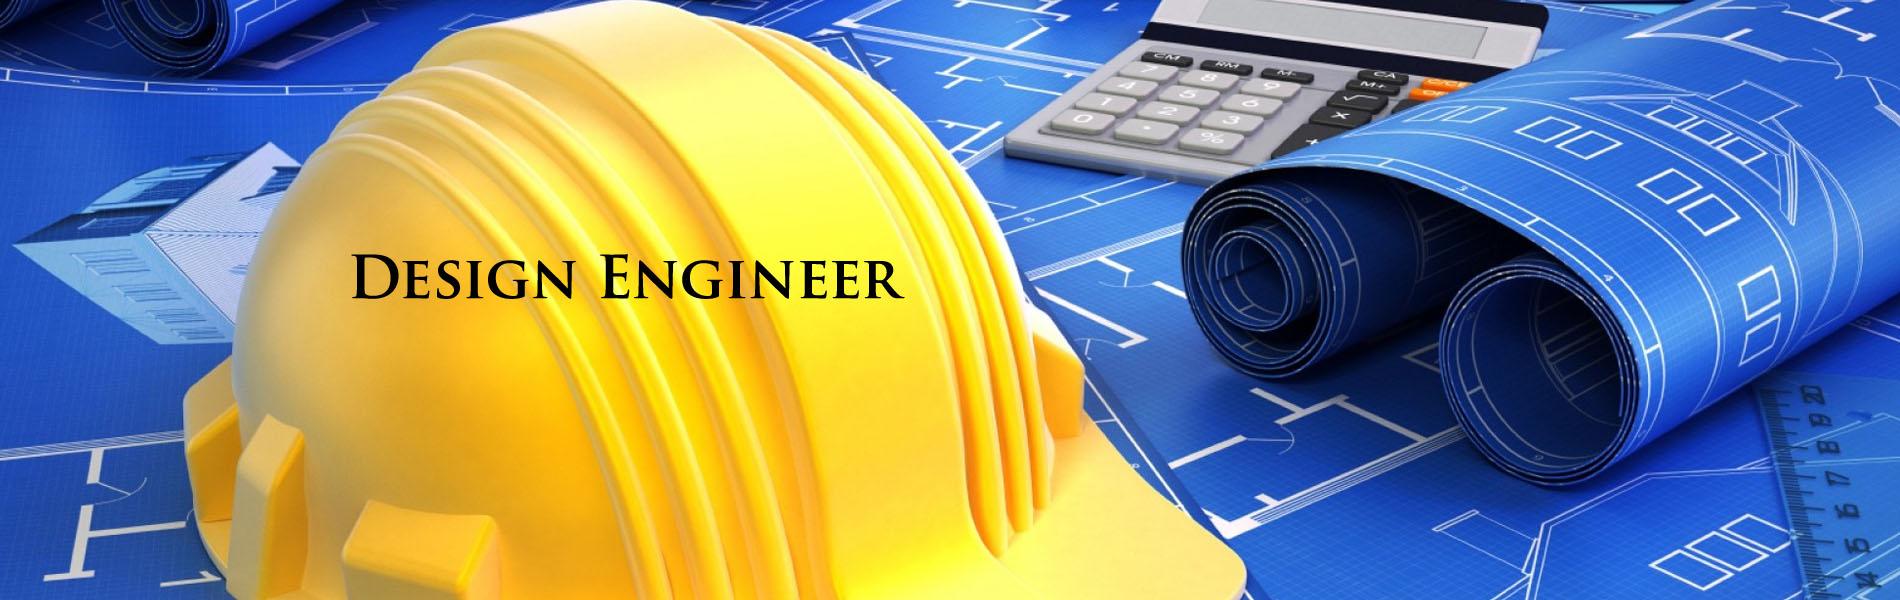 design-engineer, Arya Logo, Arya College of Engineering and iT, Arya 1st Old Campus, Arya SP42, Arya College Jaipur, Arya College, ACEIT, Best Engineering College in Rajasthan, Arya Kukas, Arya Jaipur, Top 5 Engineering College in Rajasthan